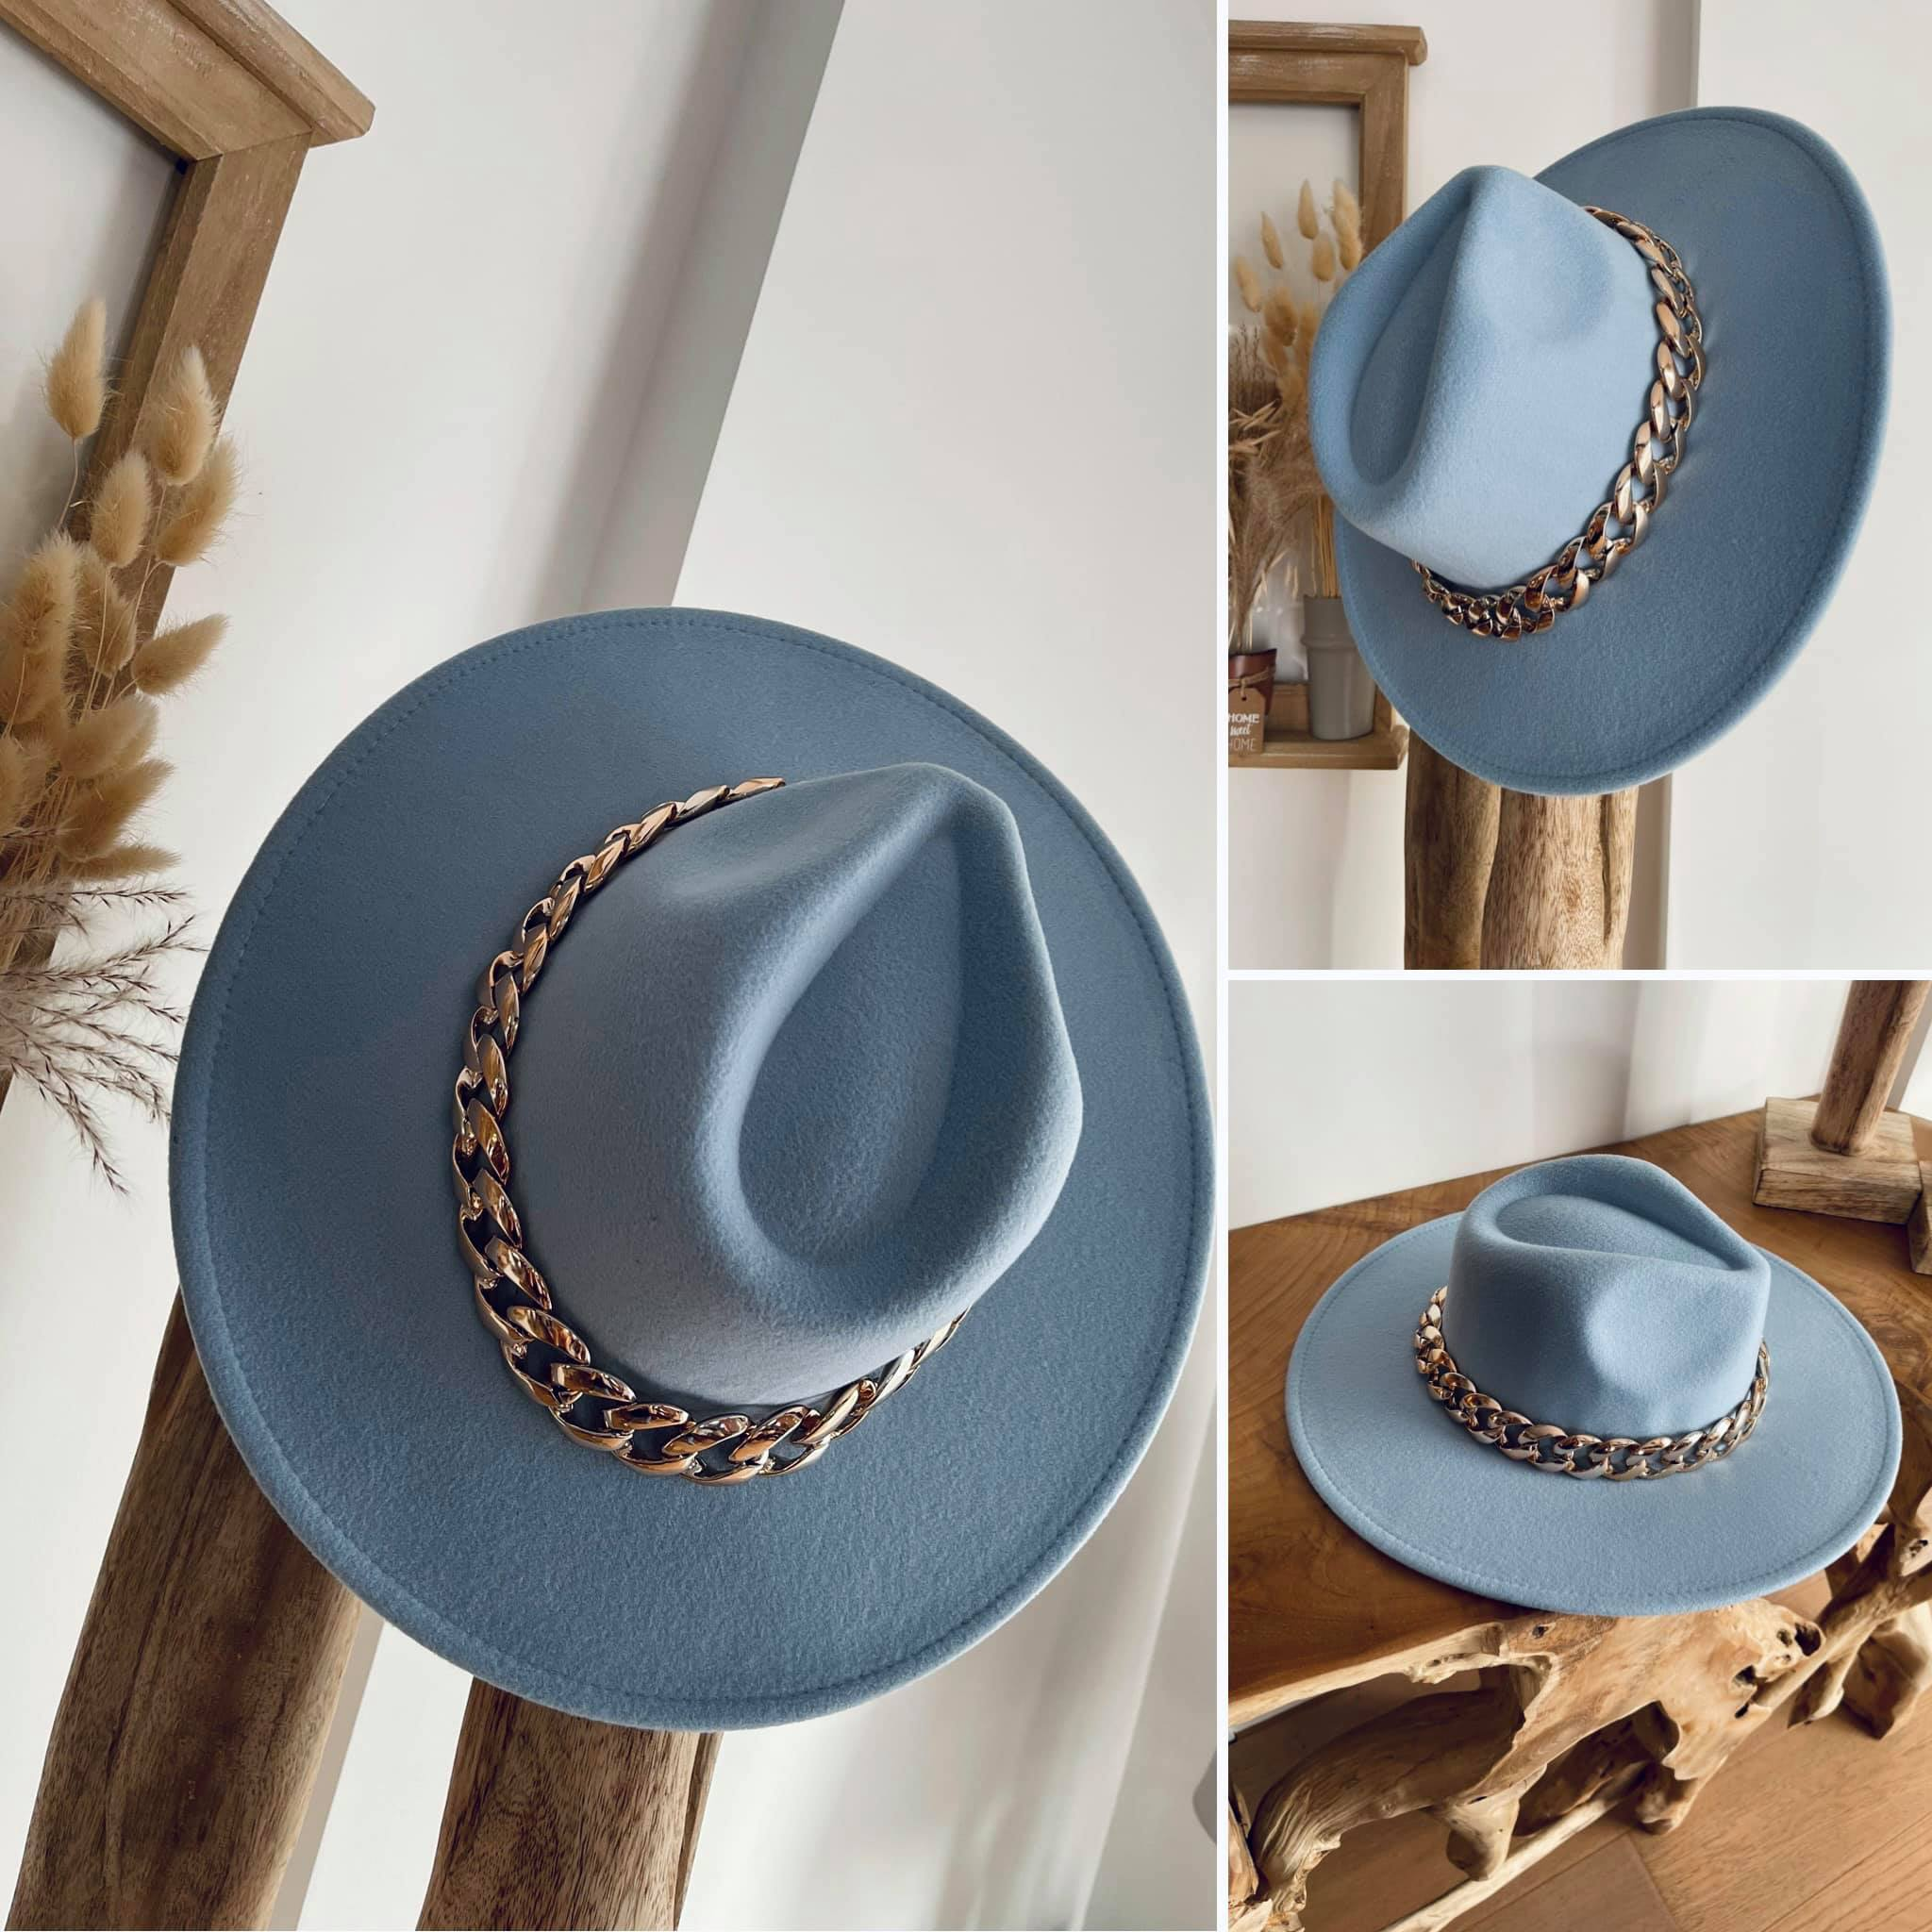 Jazz bleu ciel-Chapeau avec chaîne made in ITALY